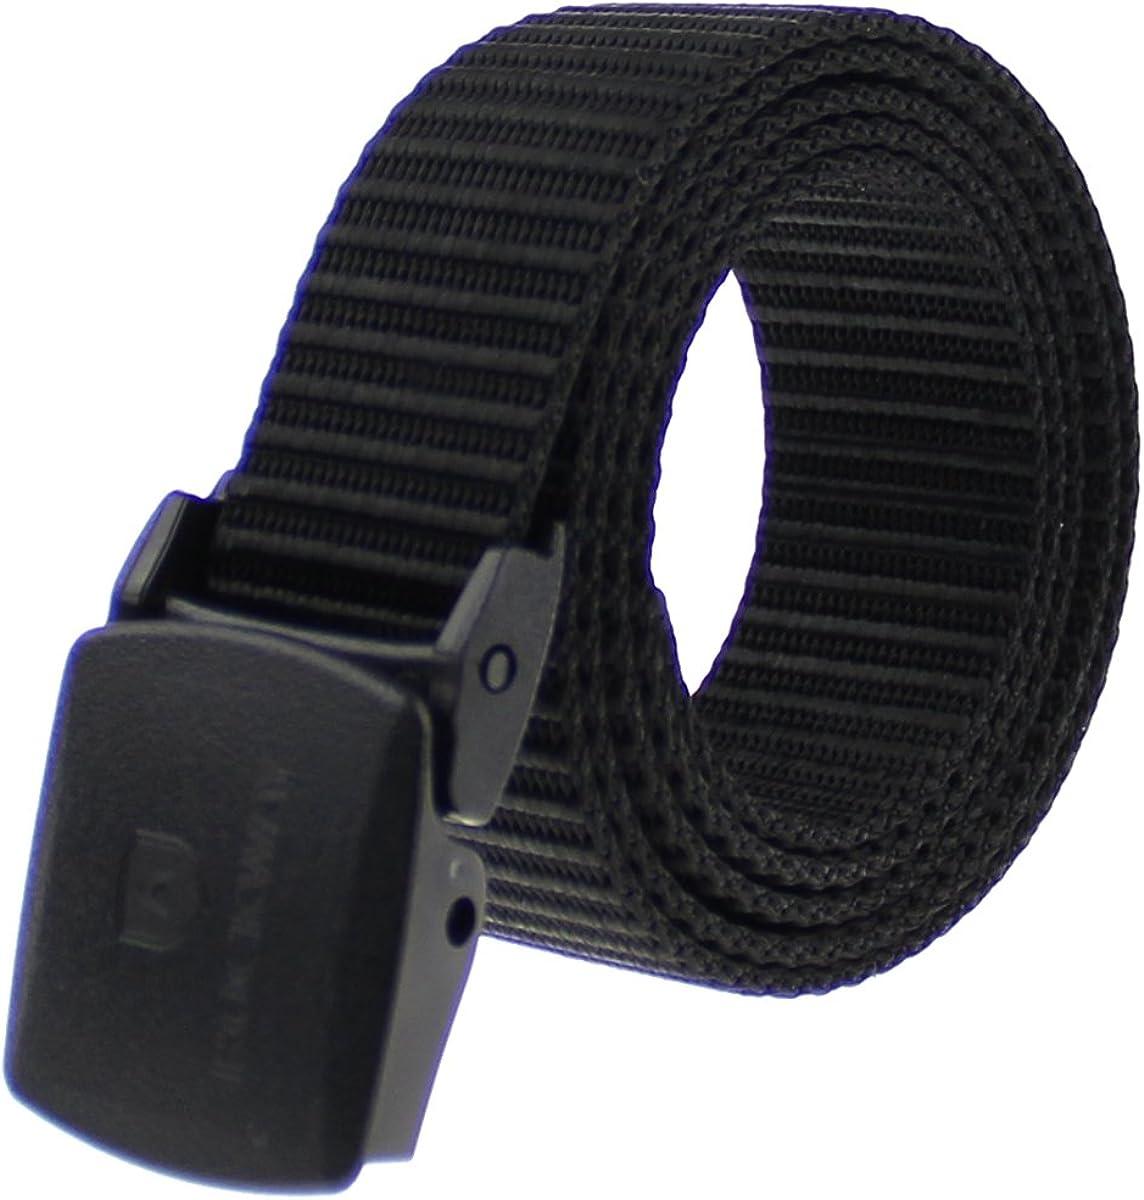 RockWay Climbing Sturdy Nylon Belt with YKK POM Buckle 1.3 Inches Wide Black Narrow Belt